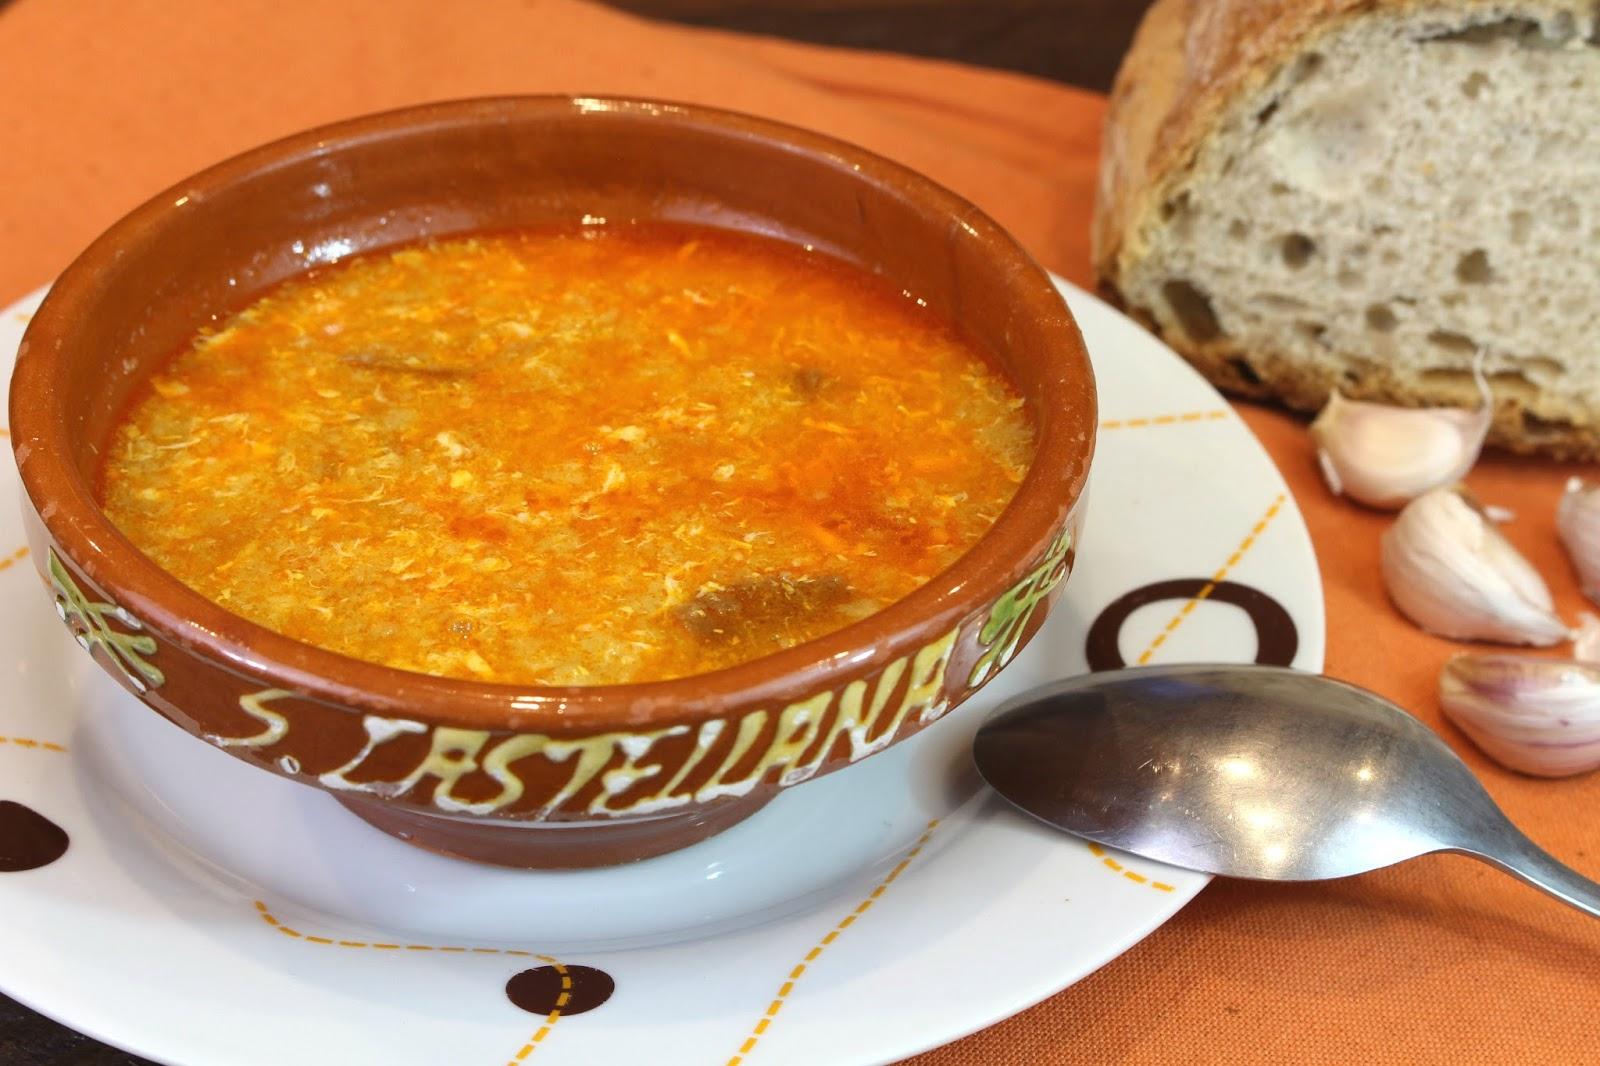 Receta de sopa de ajo o sopa castellana con Thermomix